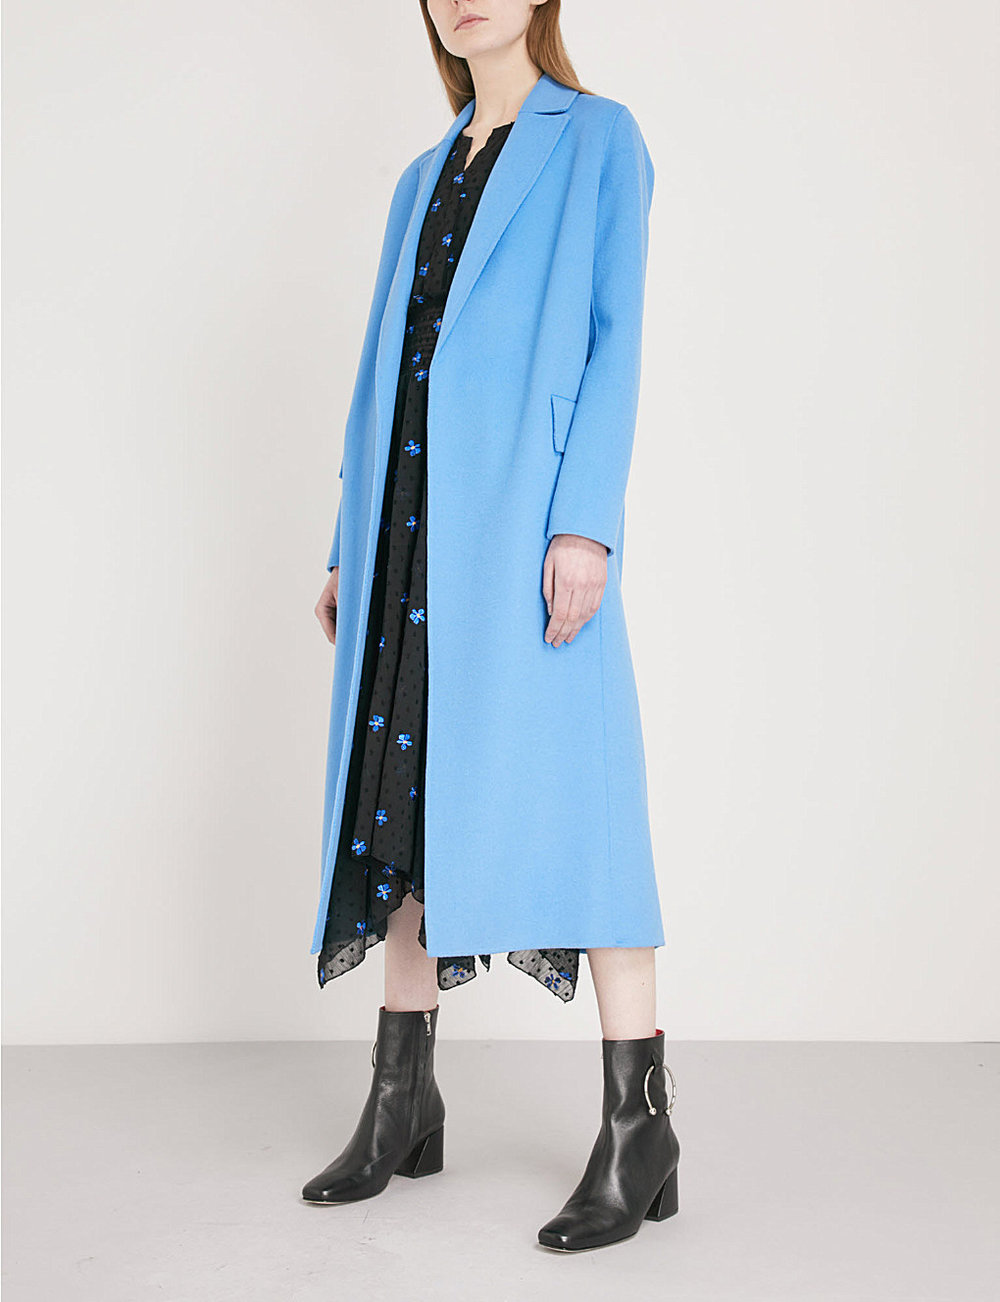 - Maje / Geode Wool Blend Coat